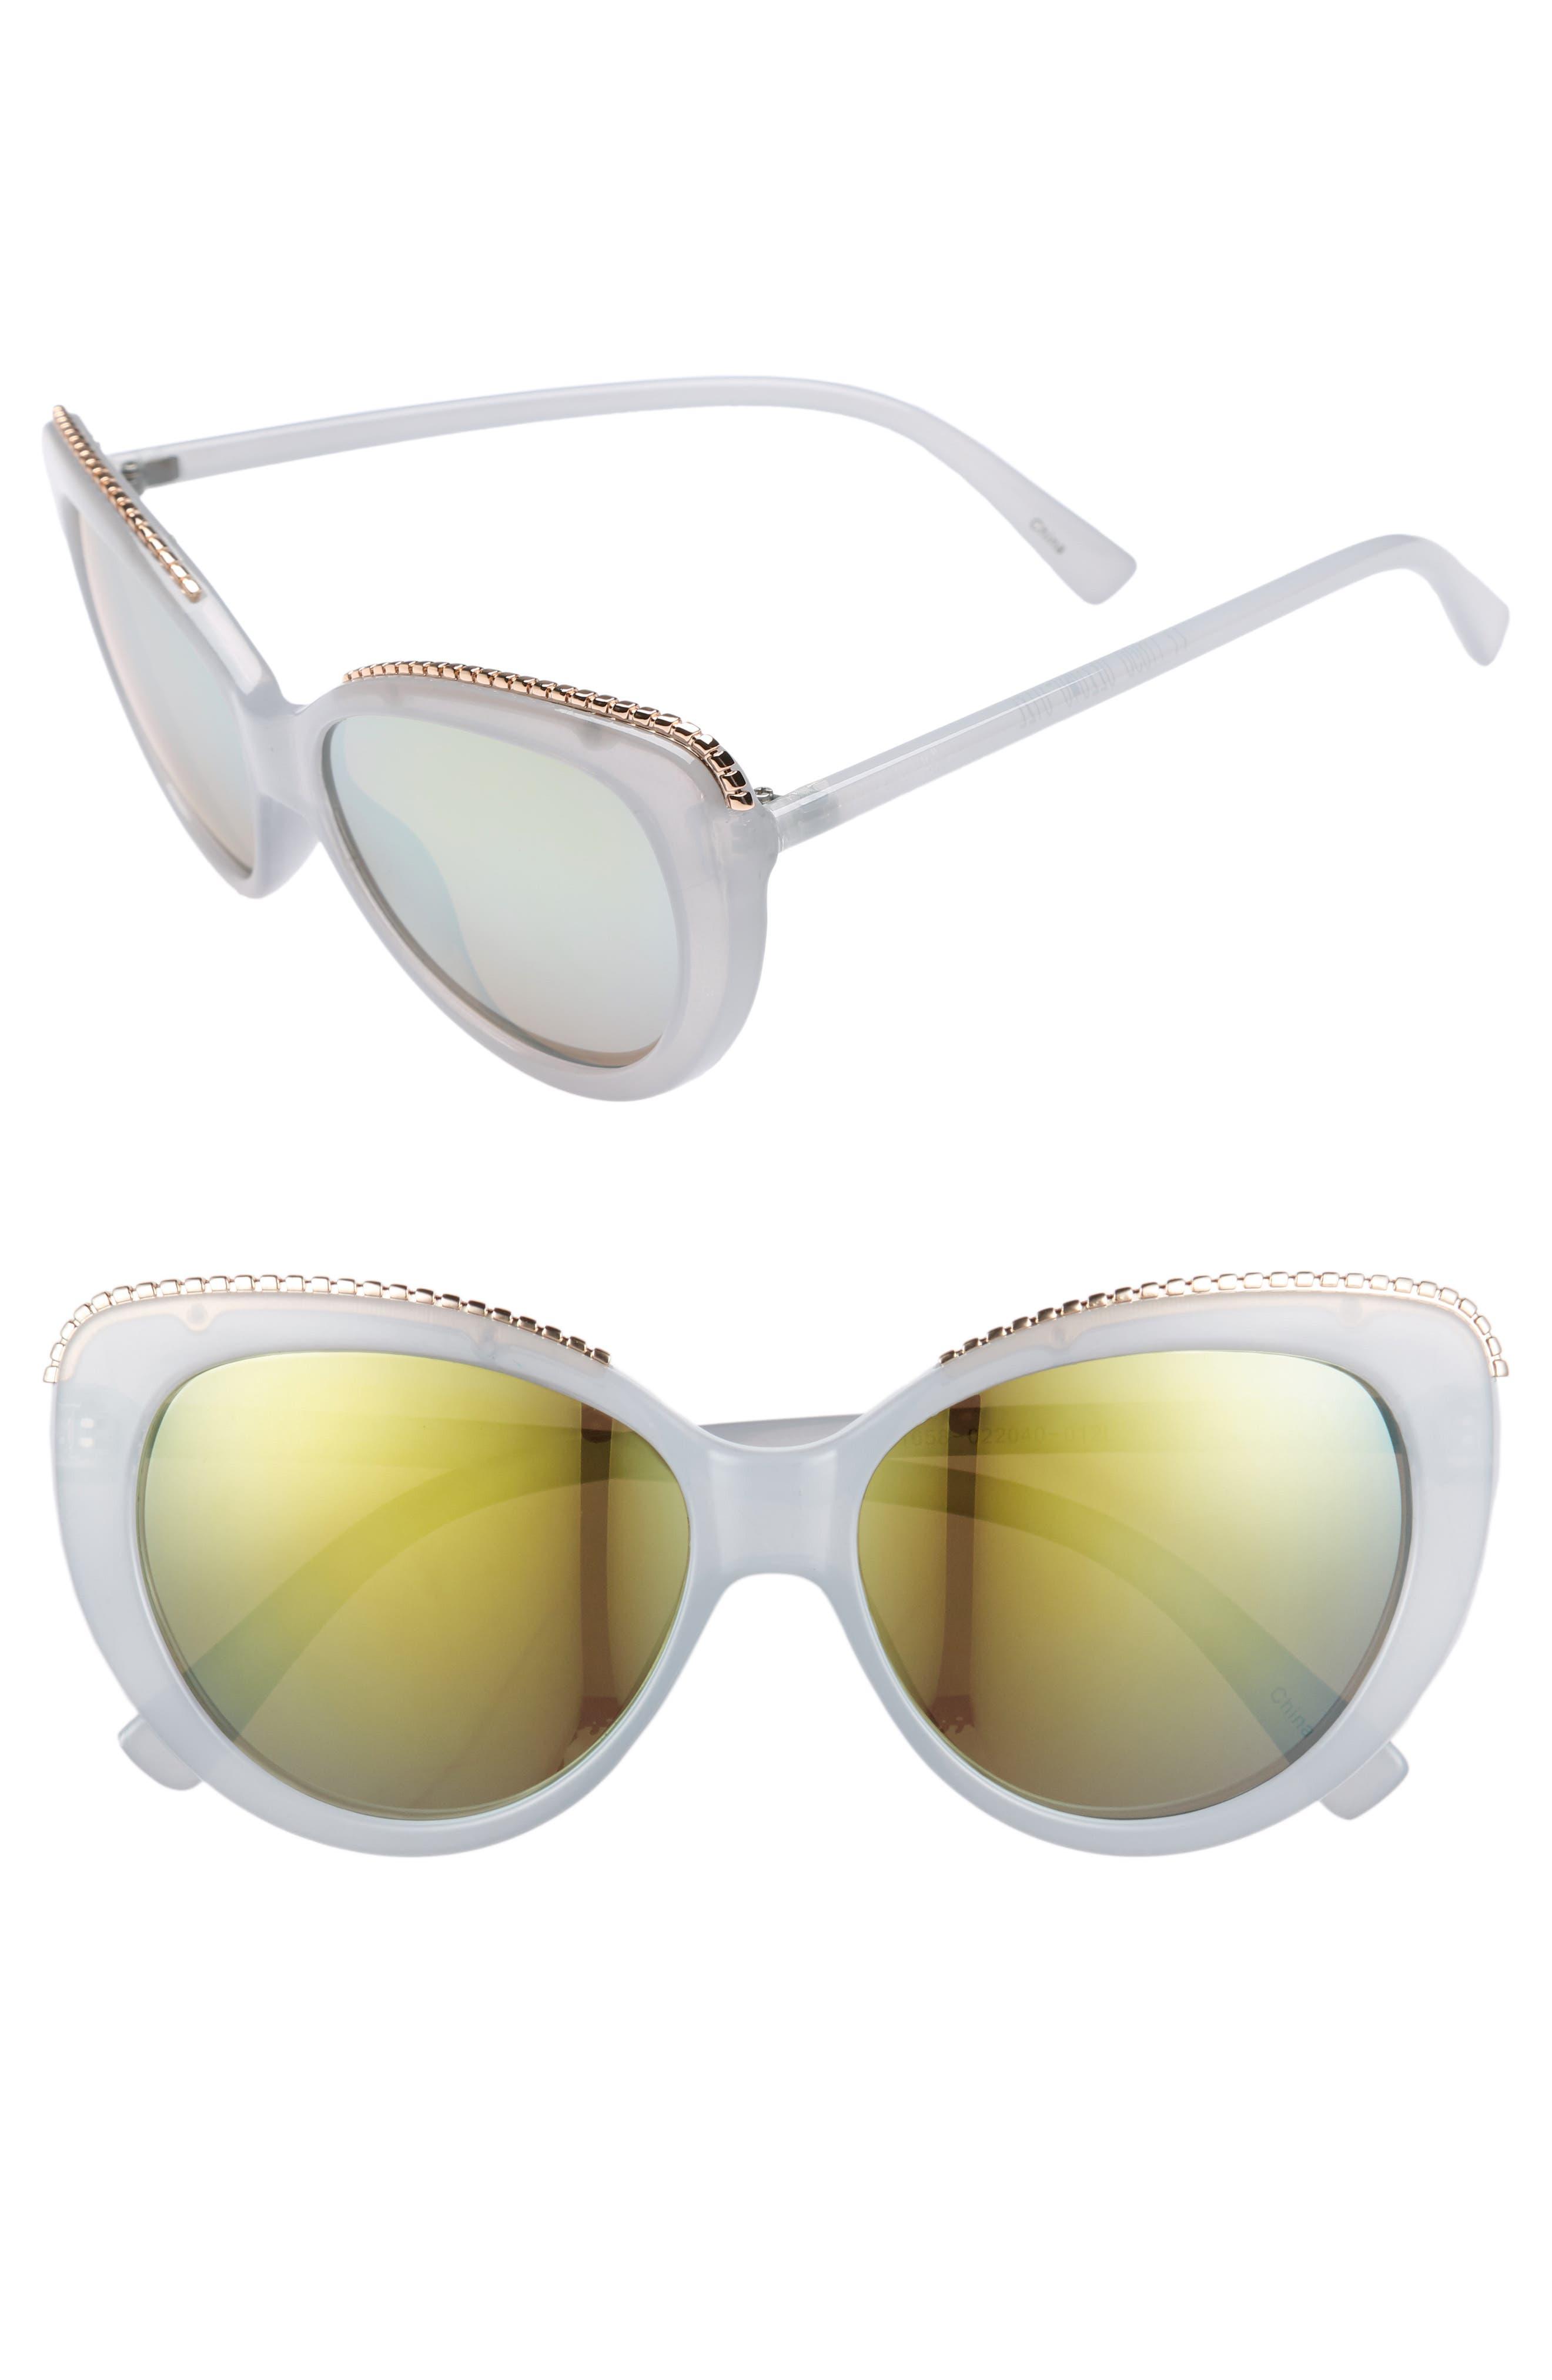 54mm Metal Trim Sunglasses,                         Main,                         color, Blue